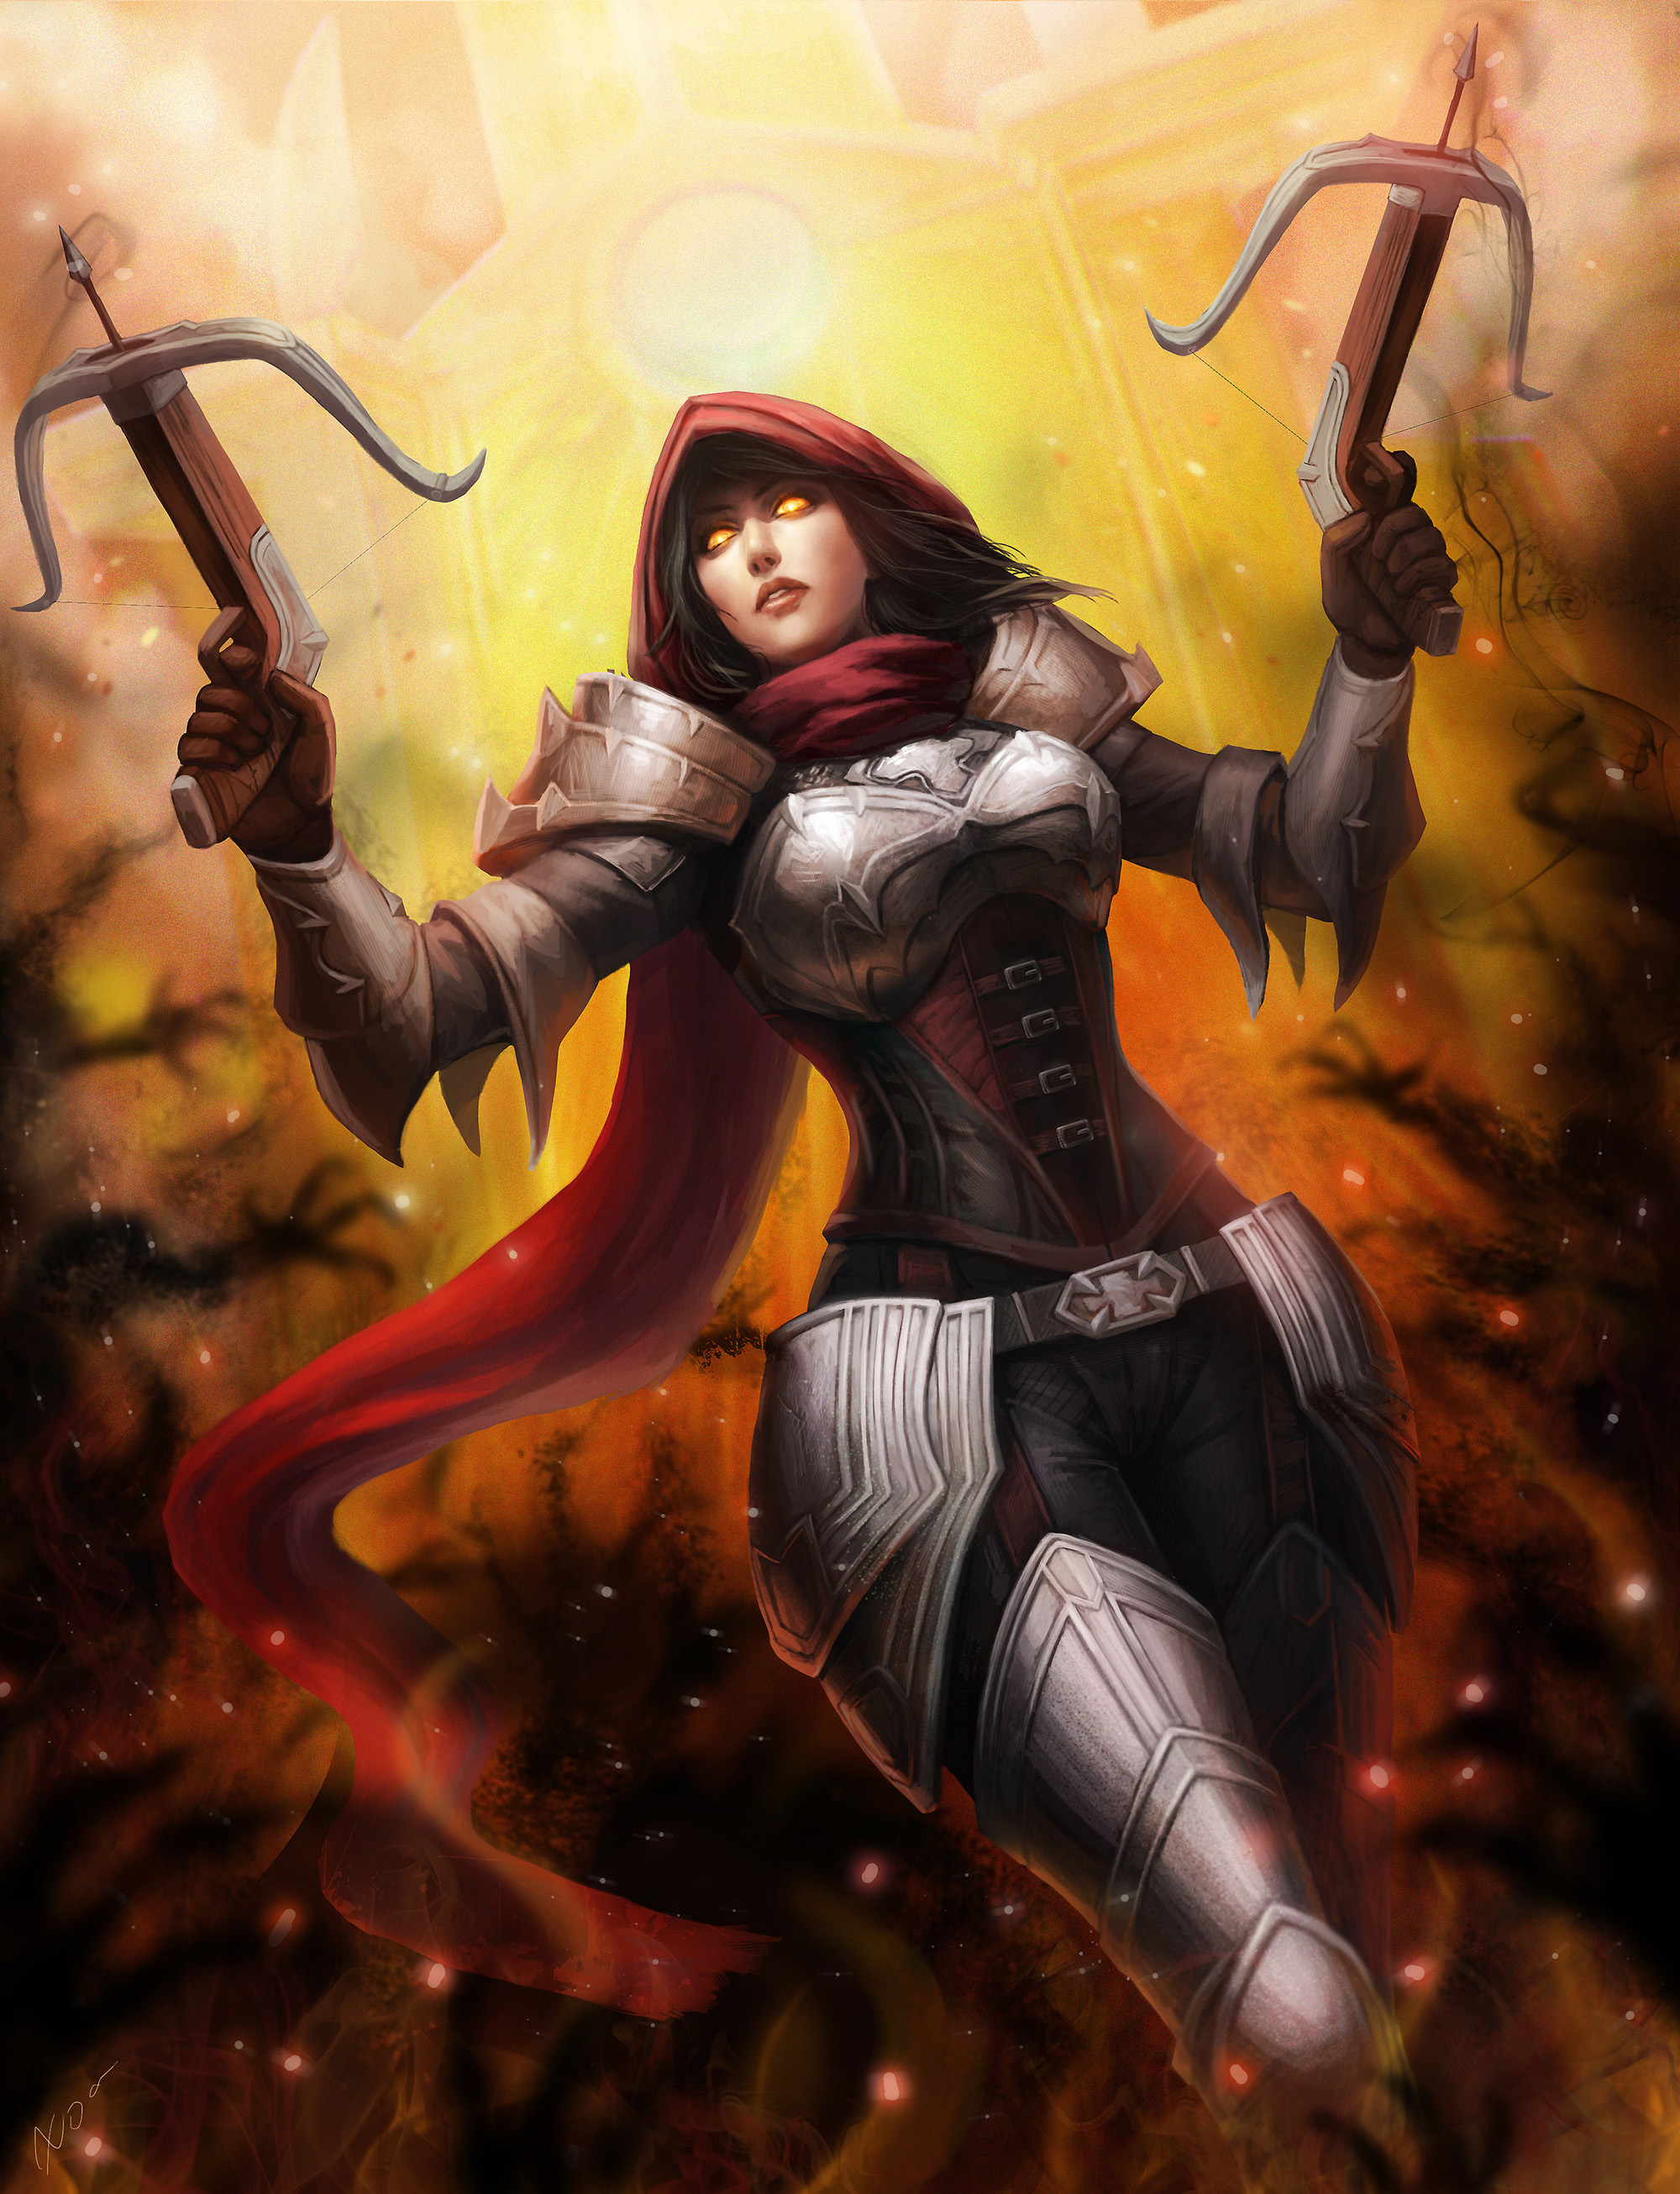 Diablo 3 :Demon Hunter by chalii